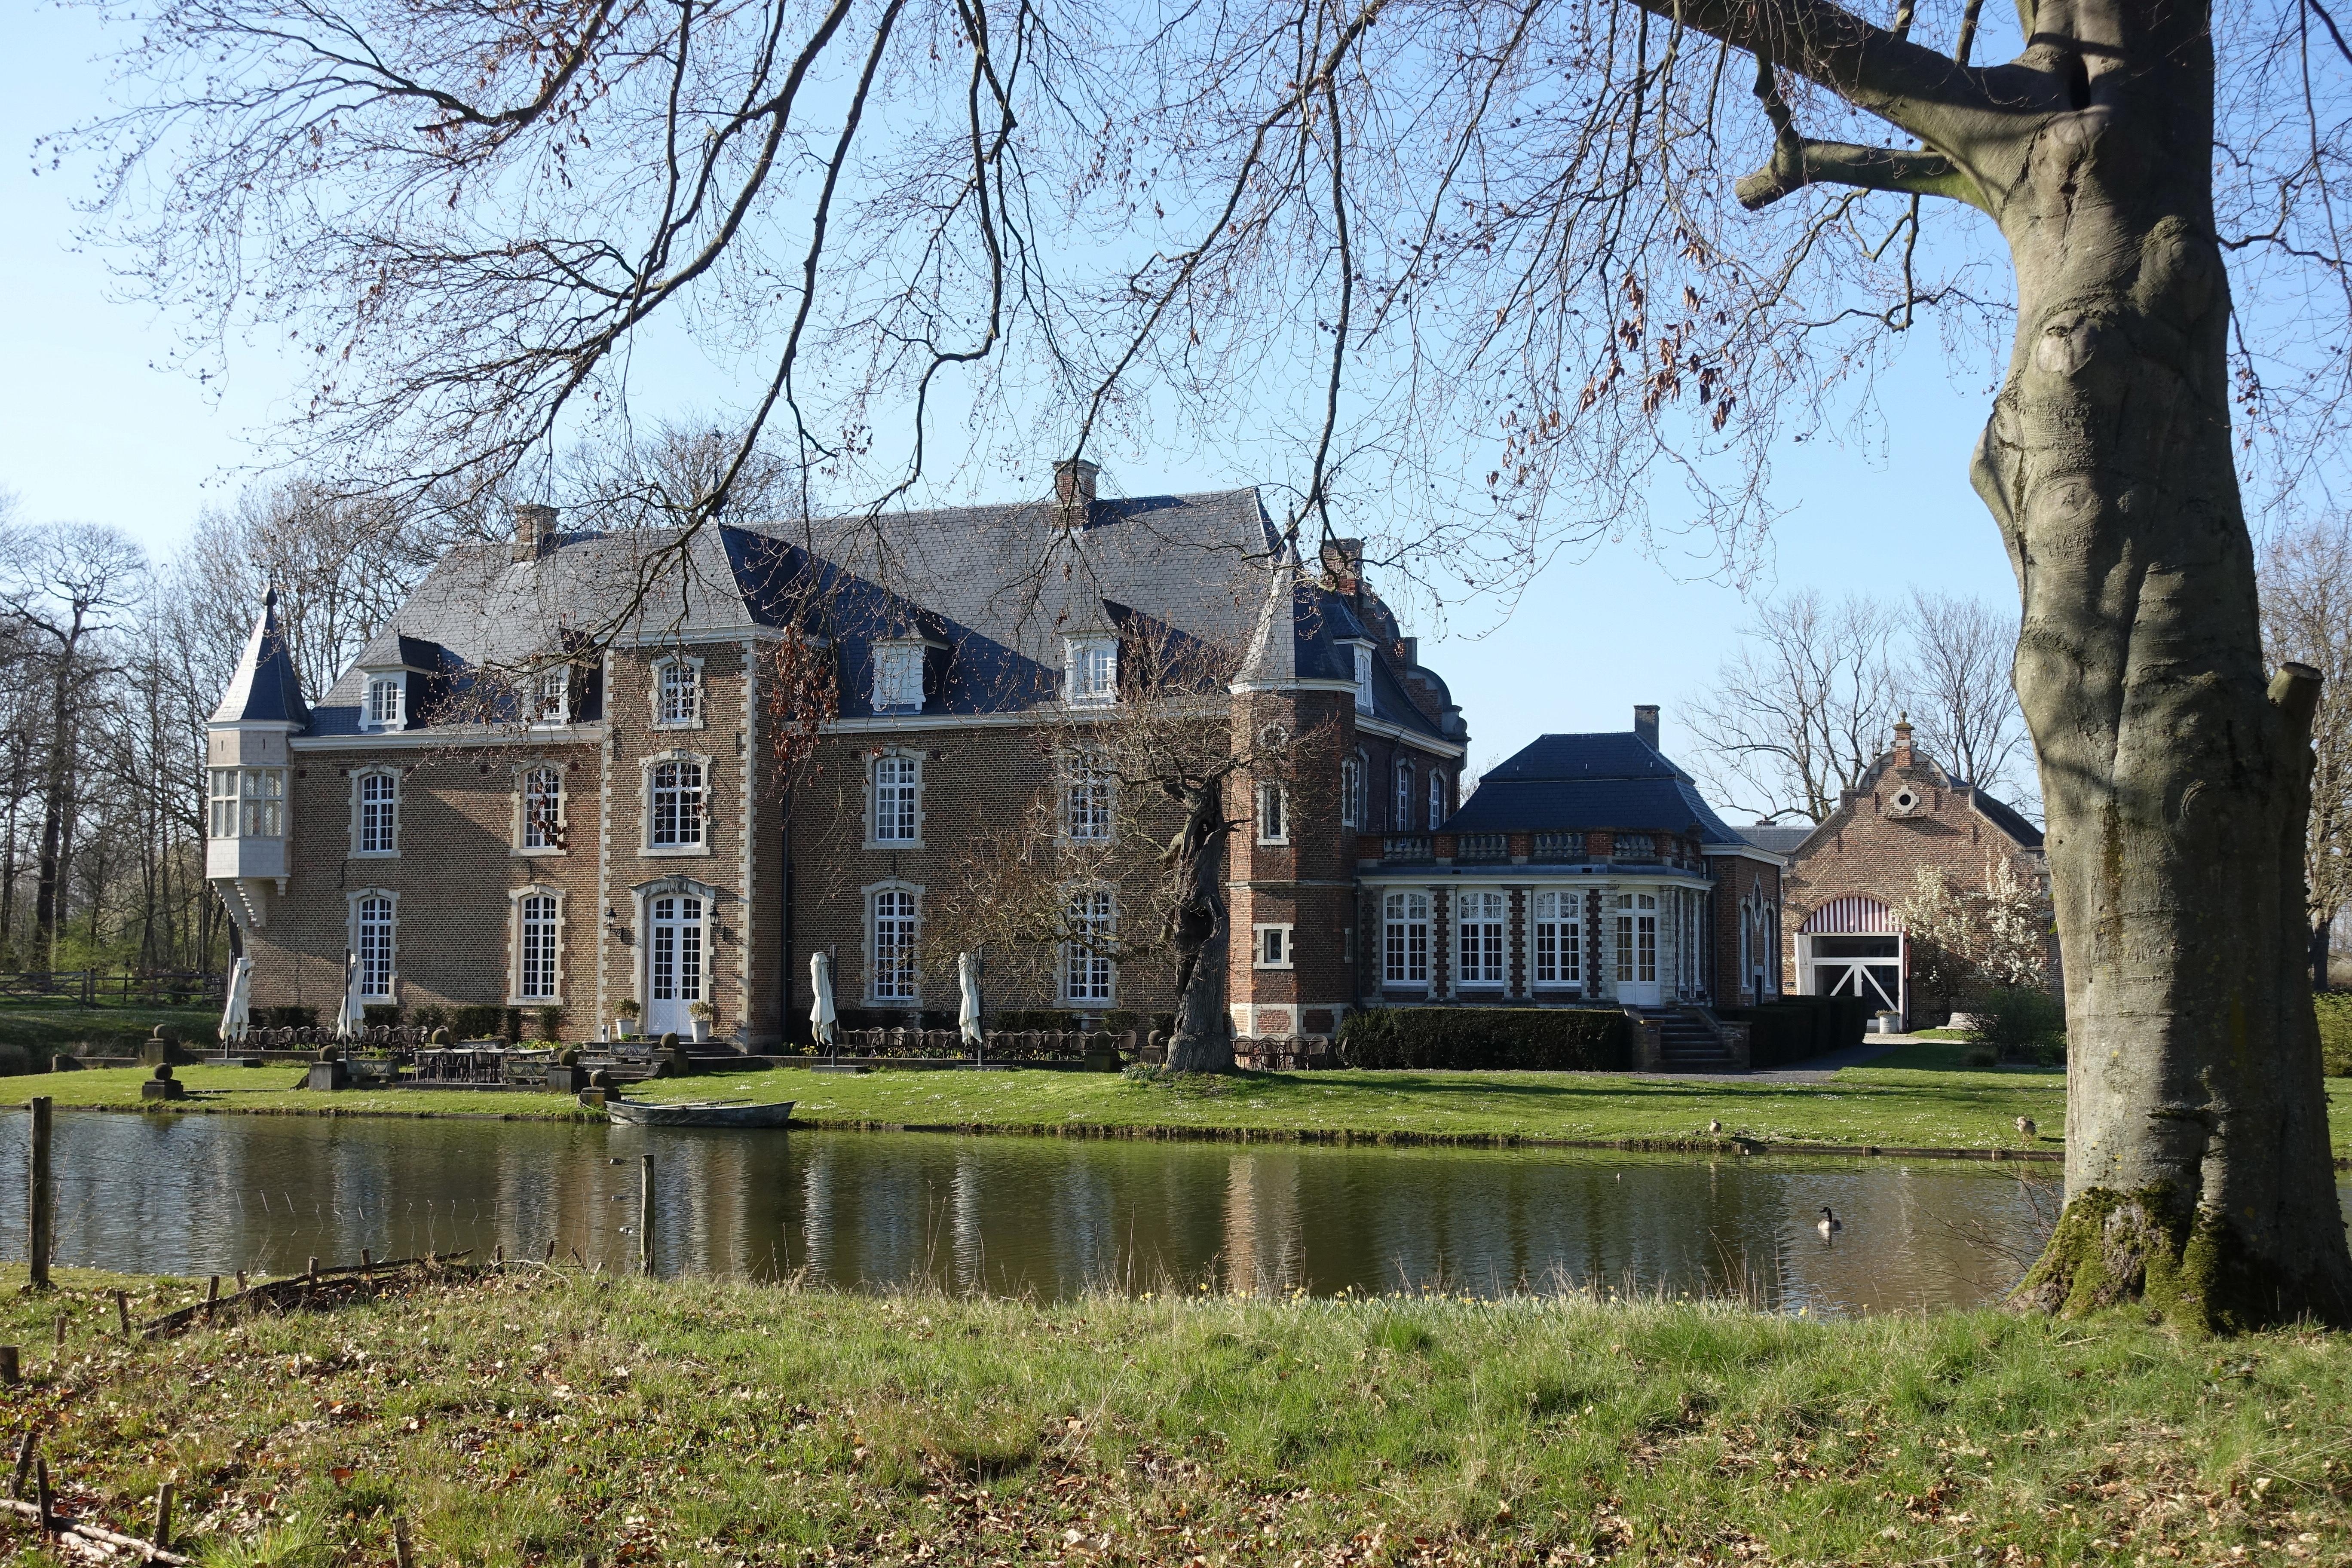 hereby publish it under the following license: English Dutch Kasteel van Bets Geetbets author name string: Eebie URL: https://commons.wikimedia.org/wiki/user:Eebie